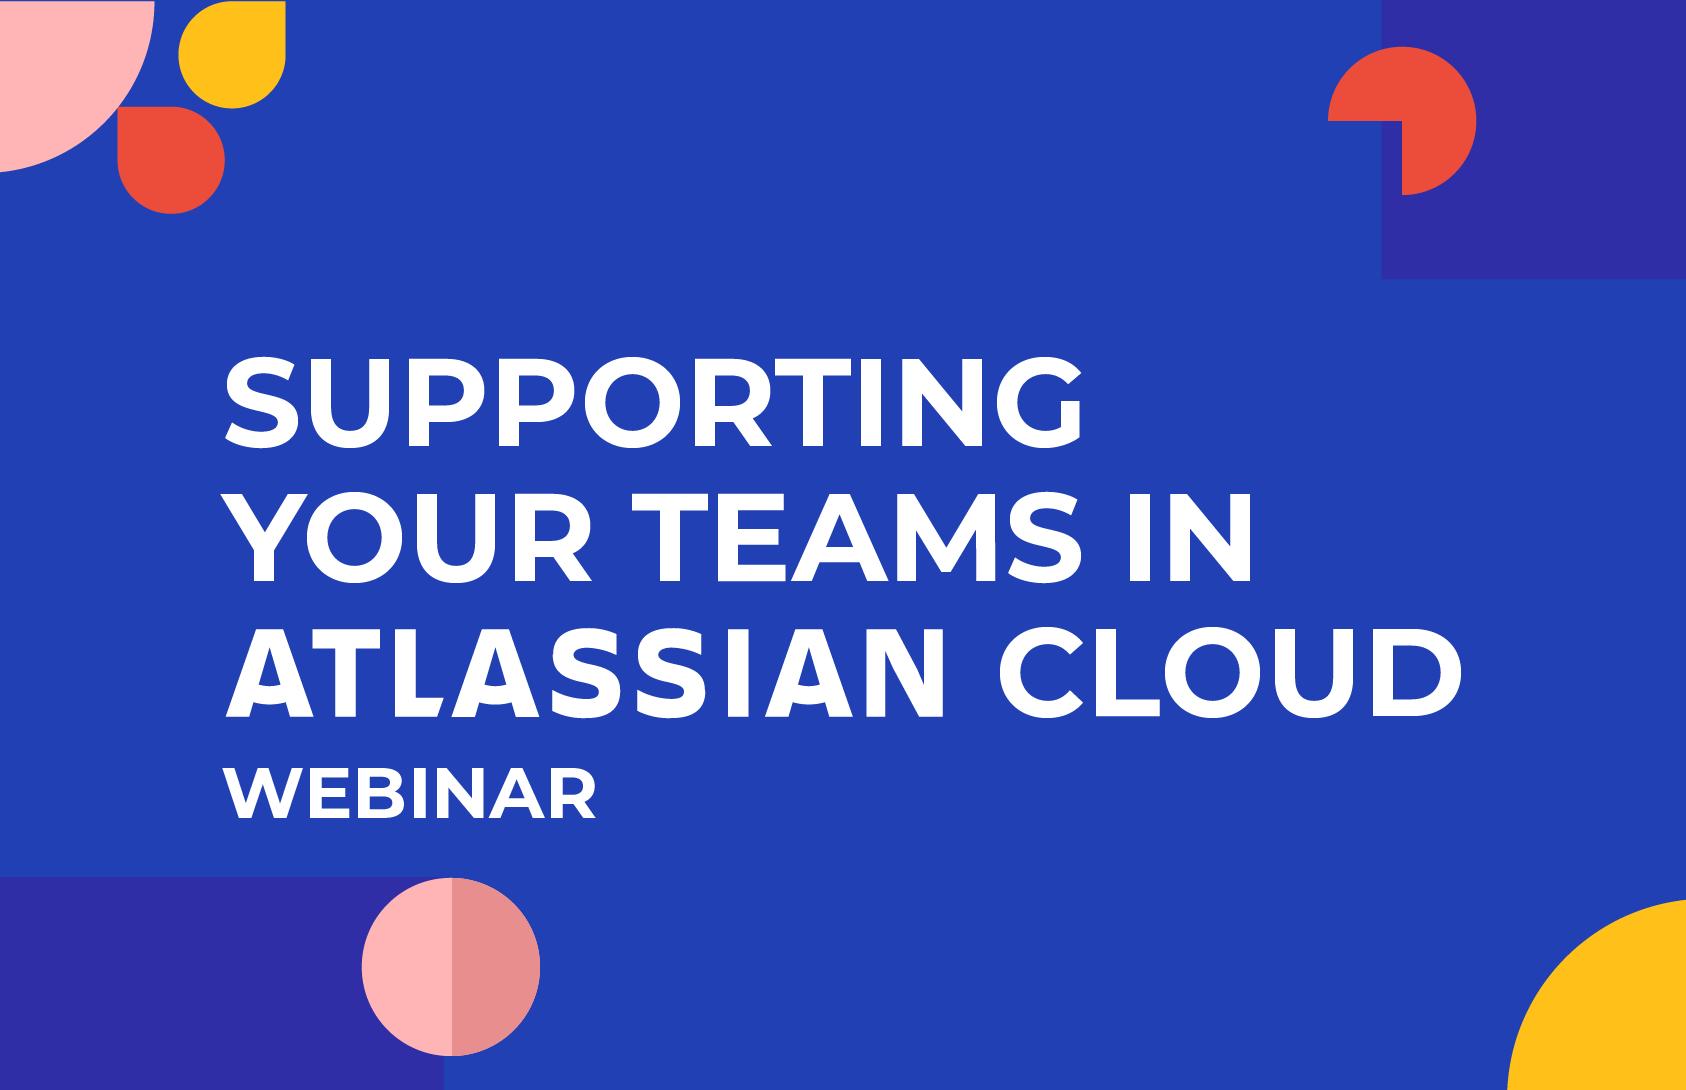 Supporting teams in Atlassian Cloud